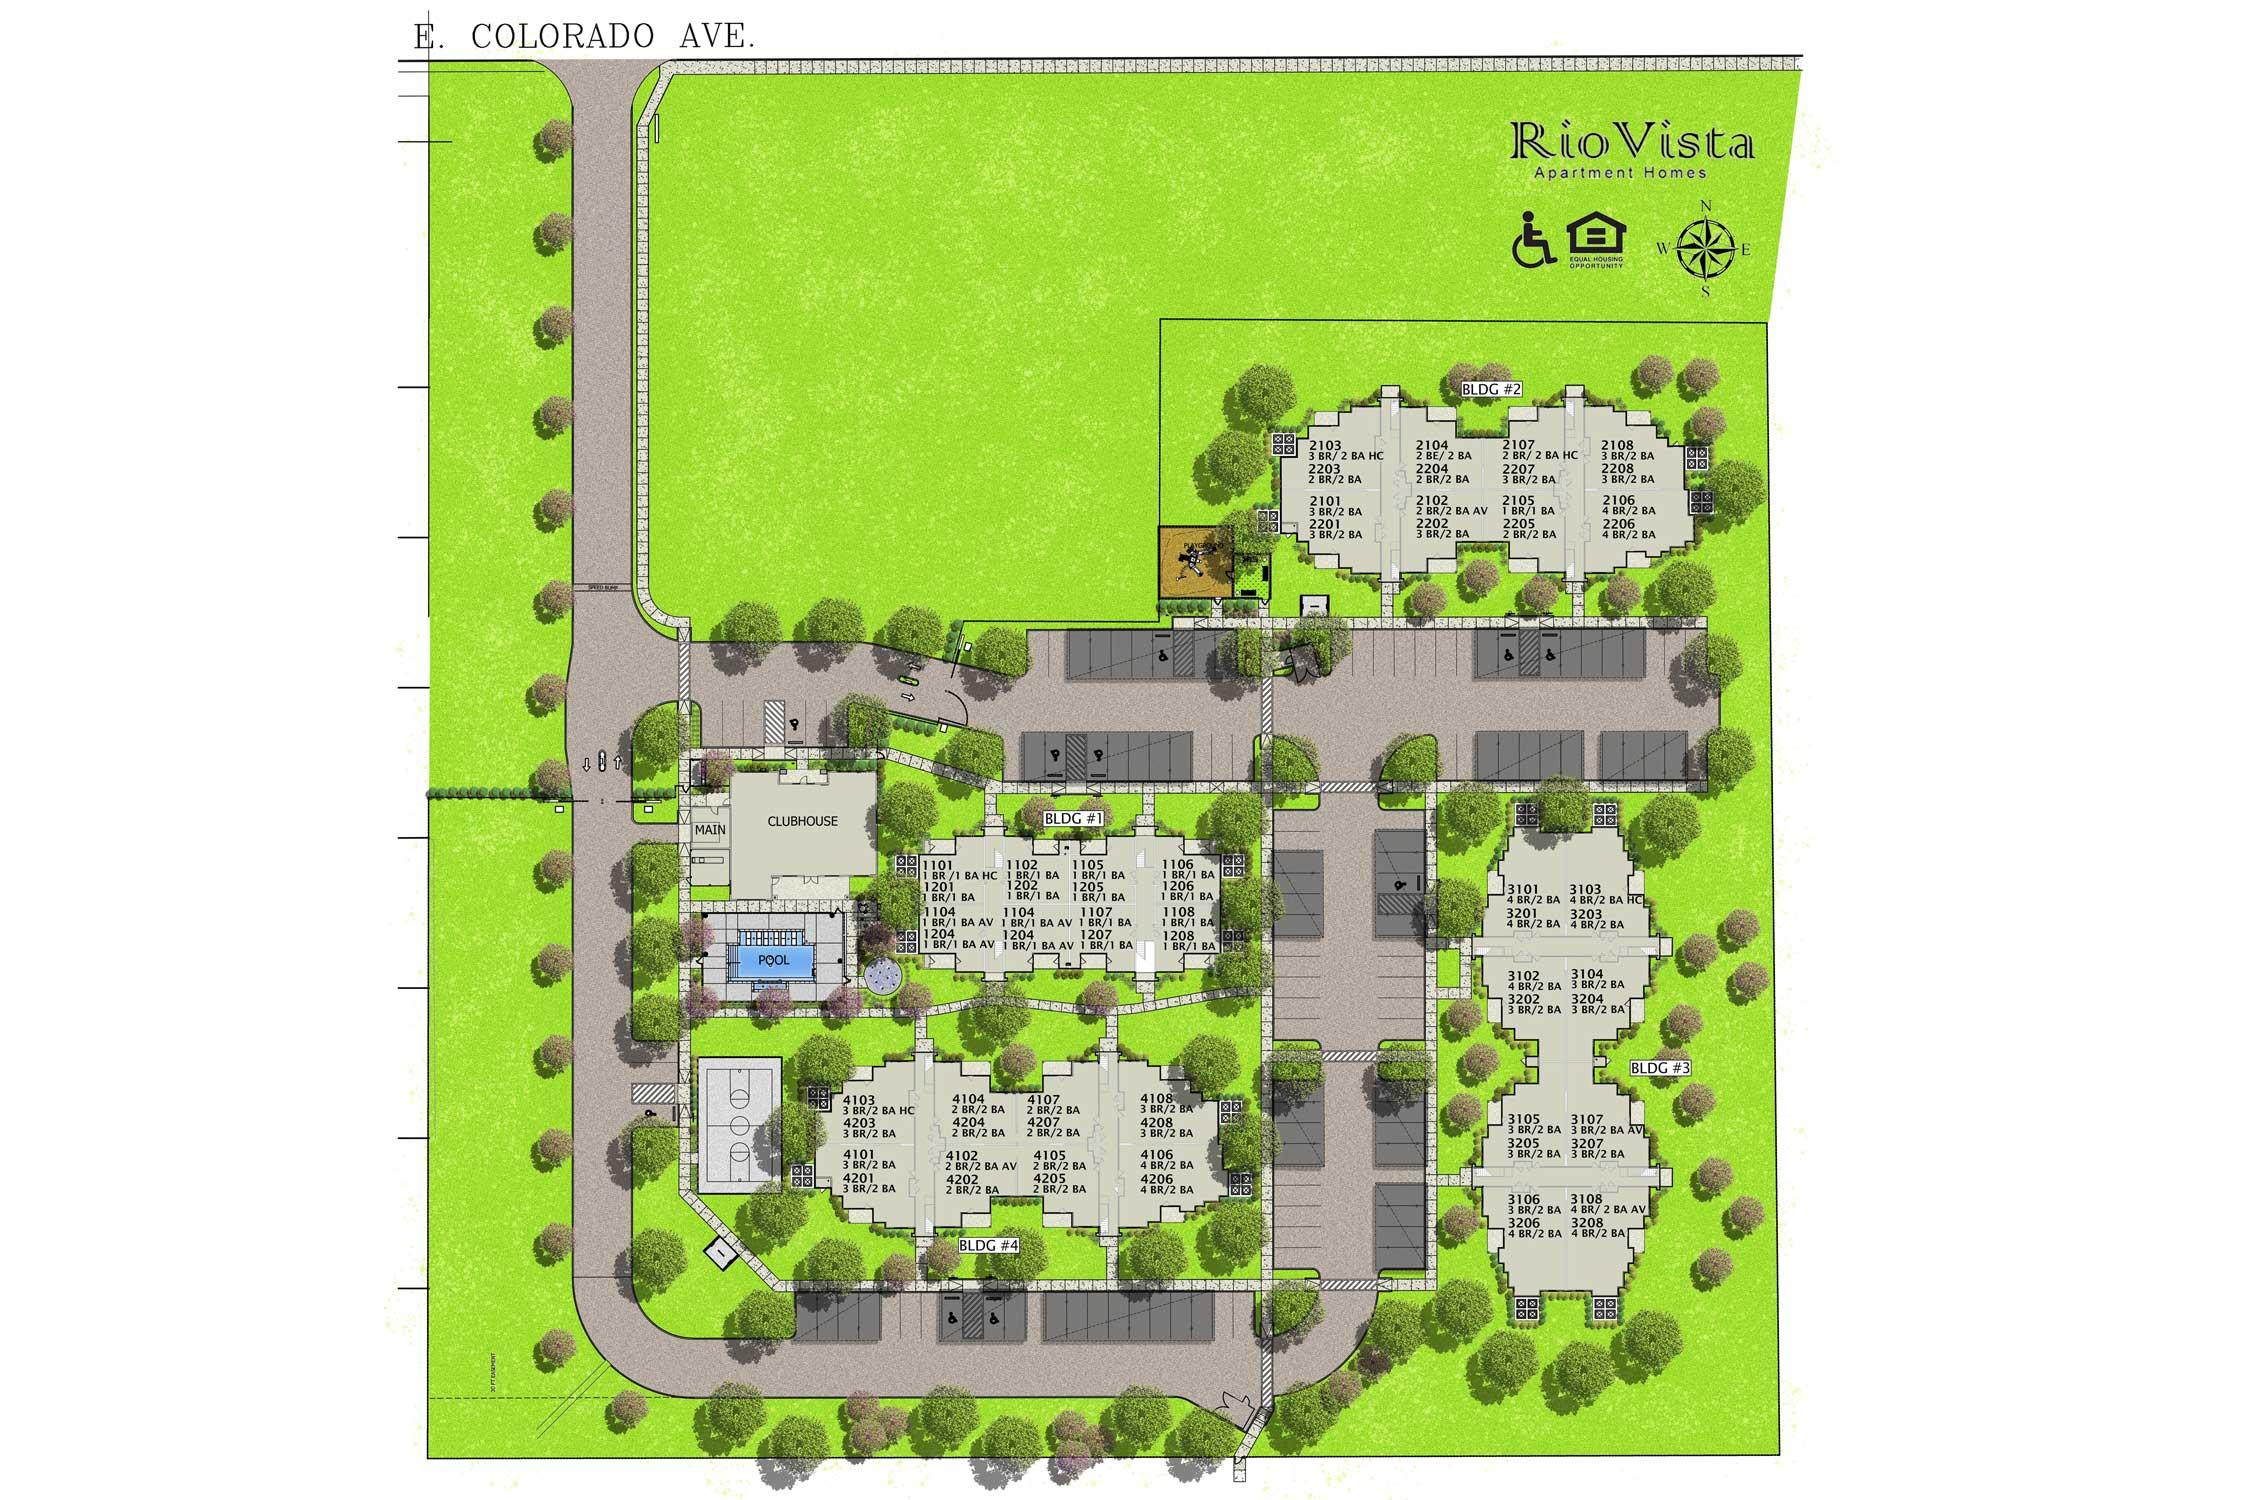 Rio Vista Apartment Homes Site Plan